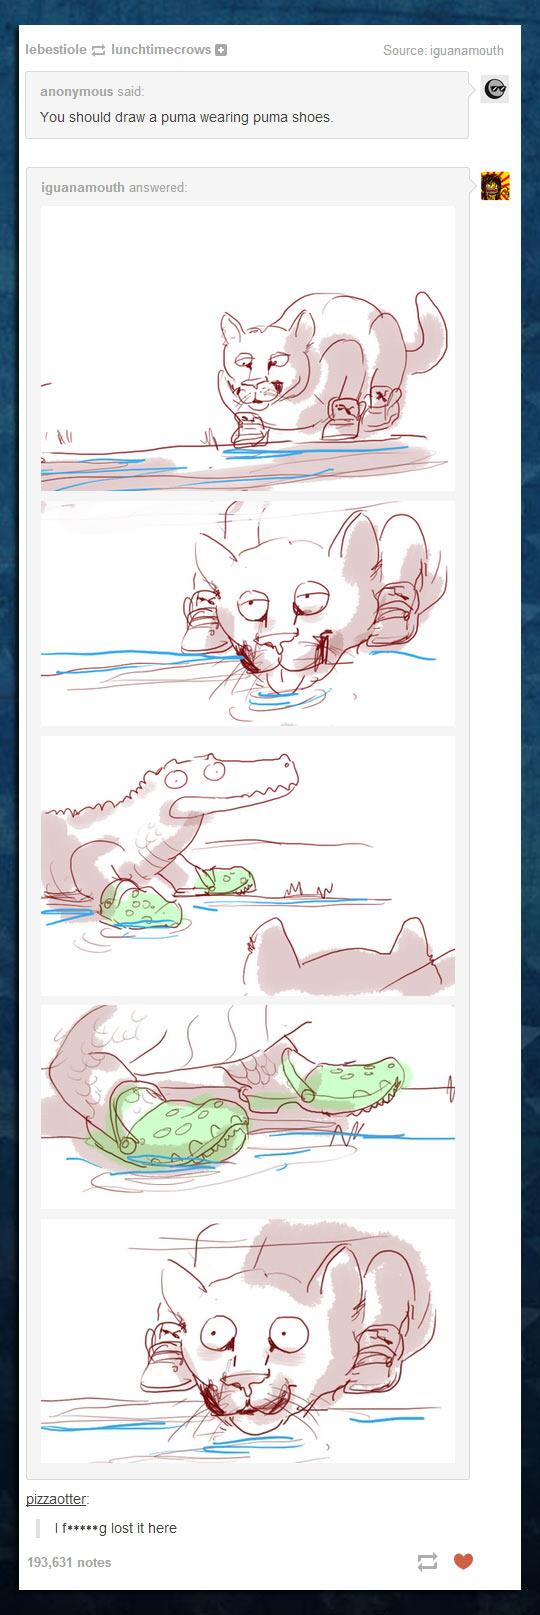 funny-drawing-Puma-wearing-Crocs